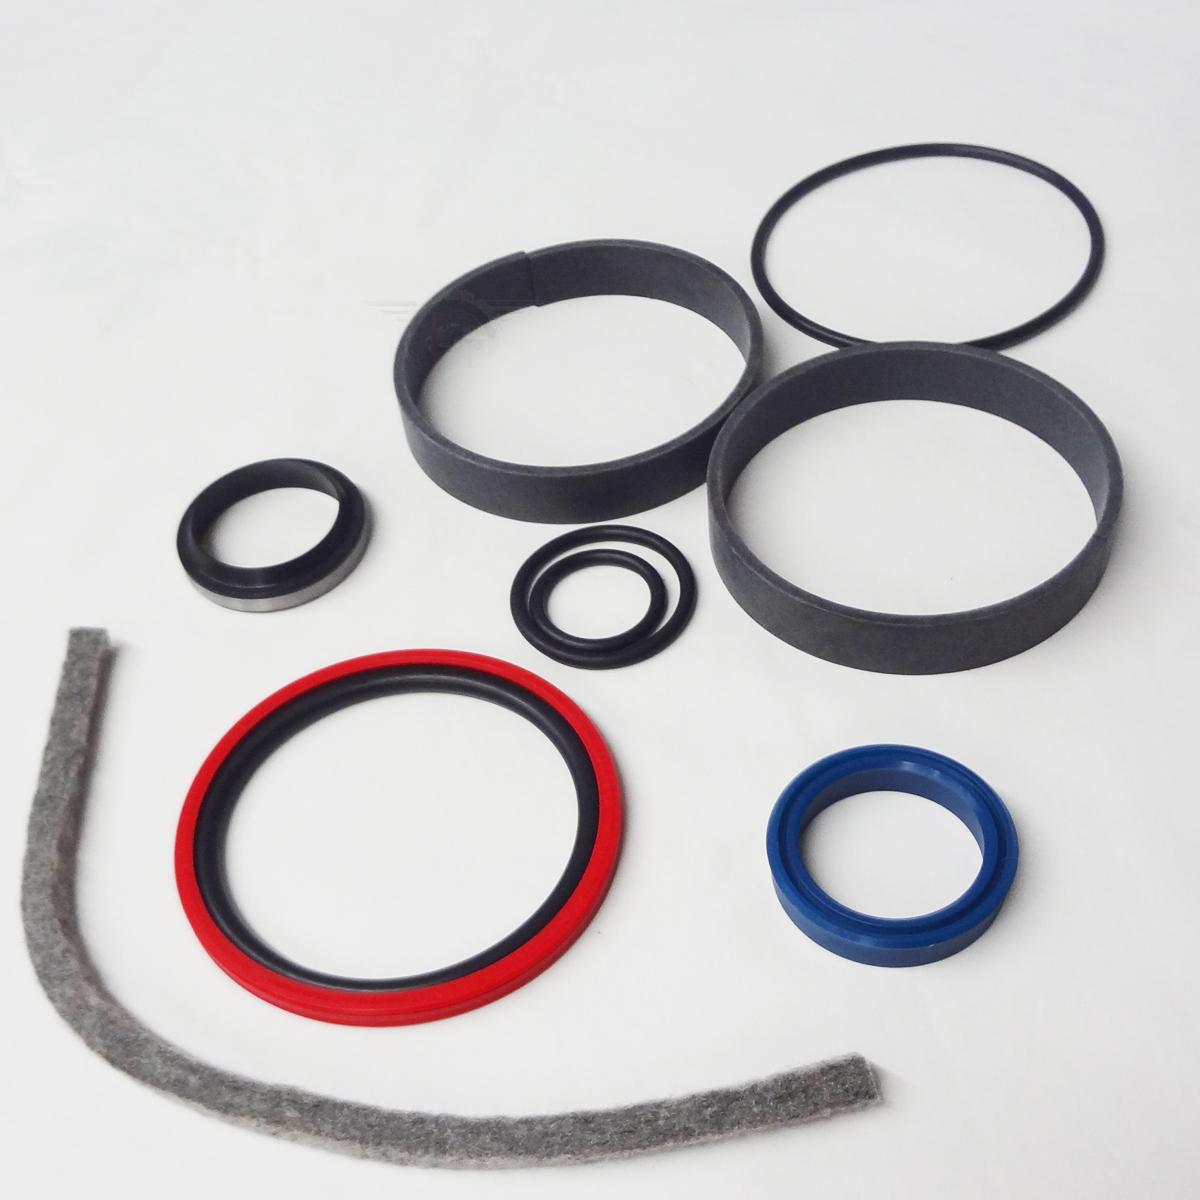 Rotary Lift FC542-12mf 4 Post Lift Cylinder Rebuild Seal Kit